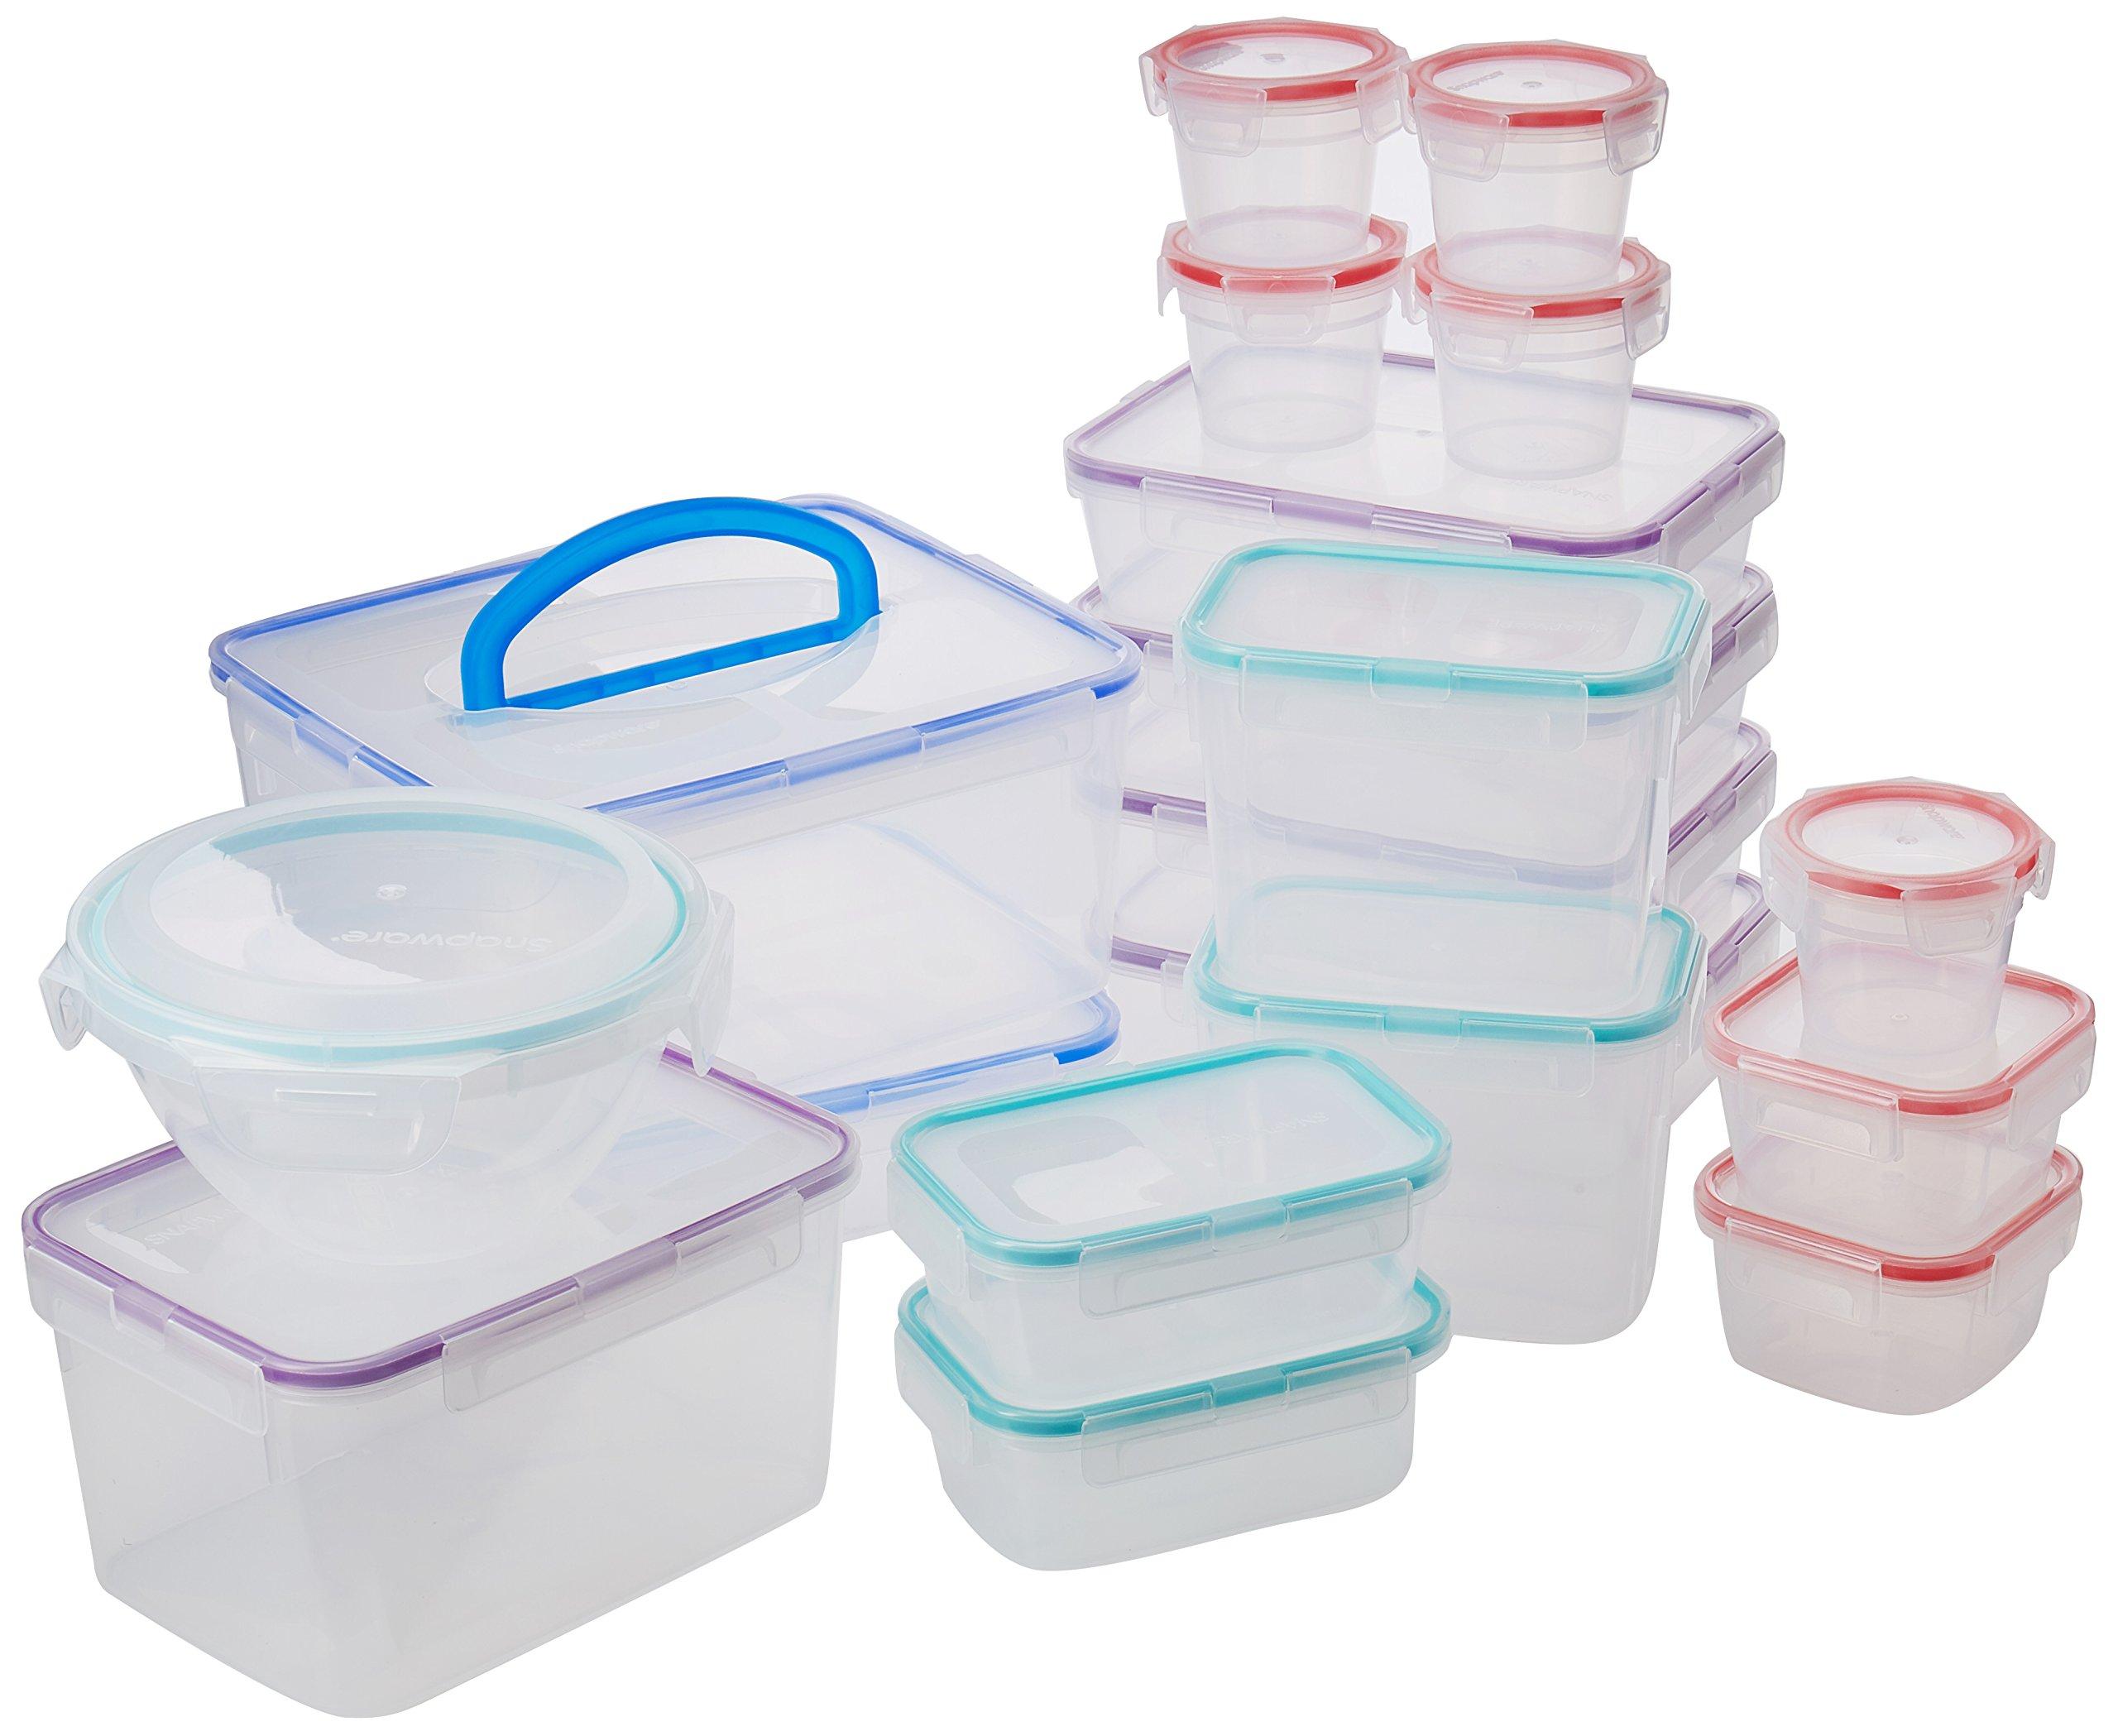 Snapware Airtight Food Storage Set, Plastic, 38-Piece